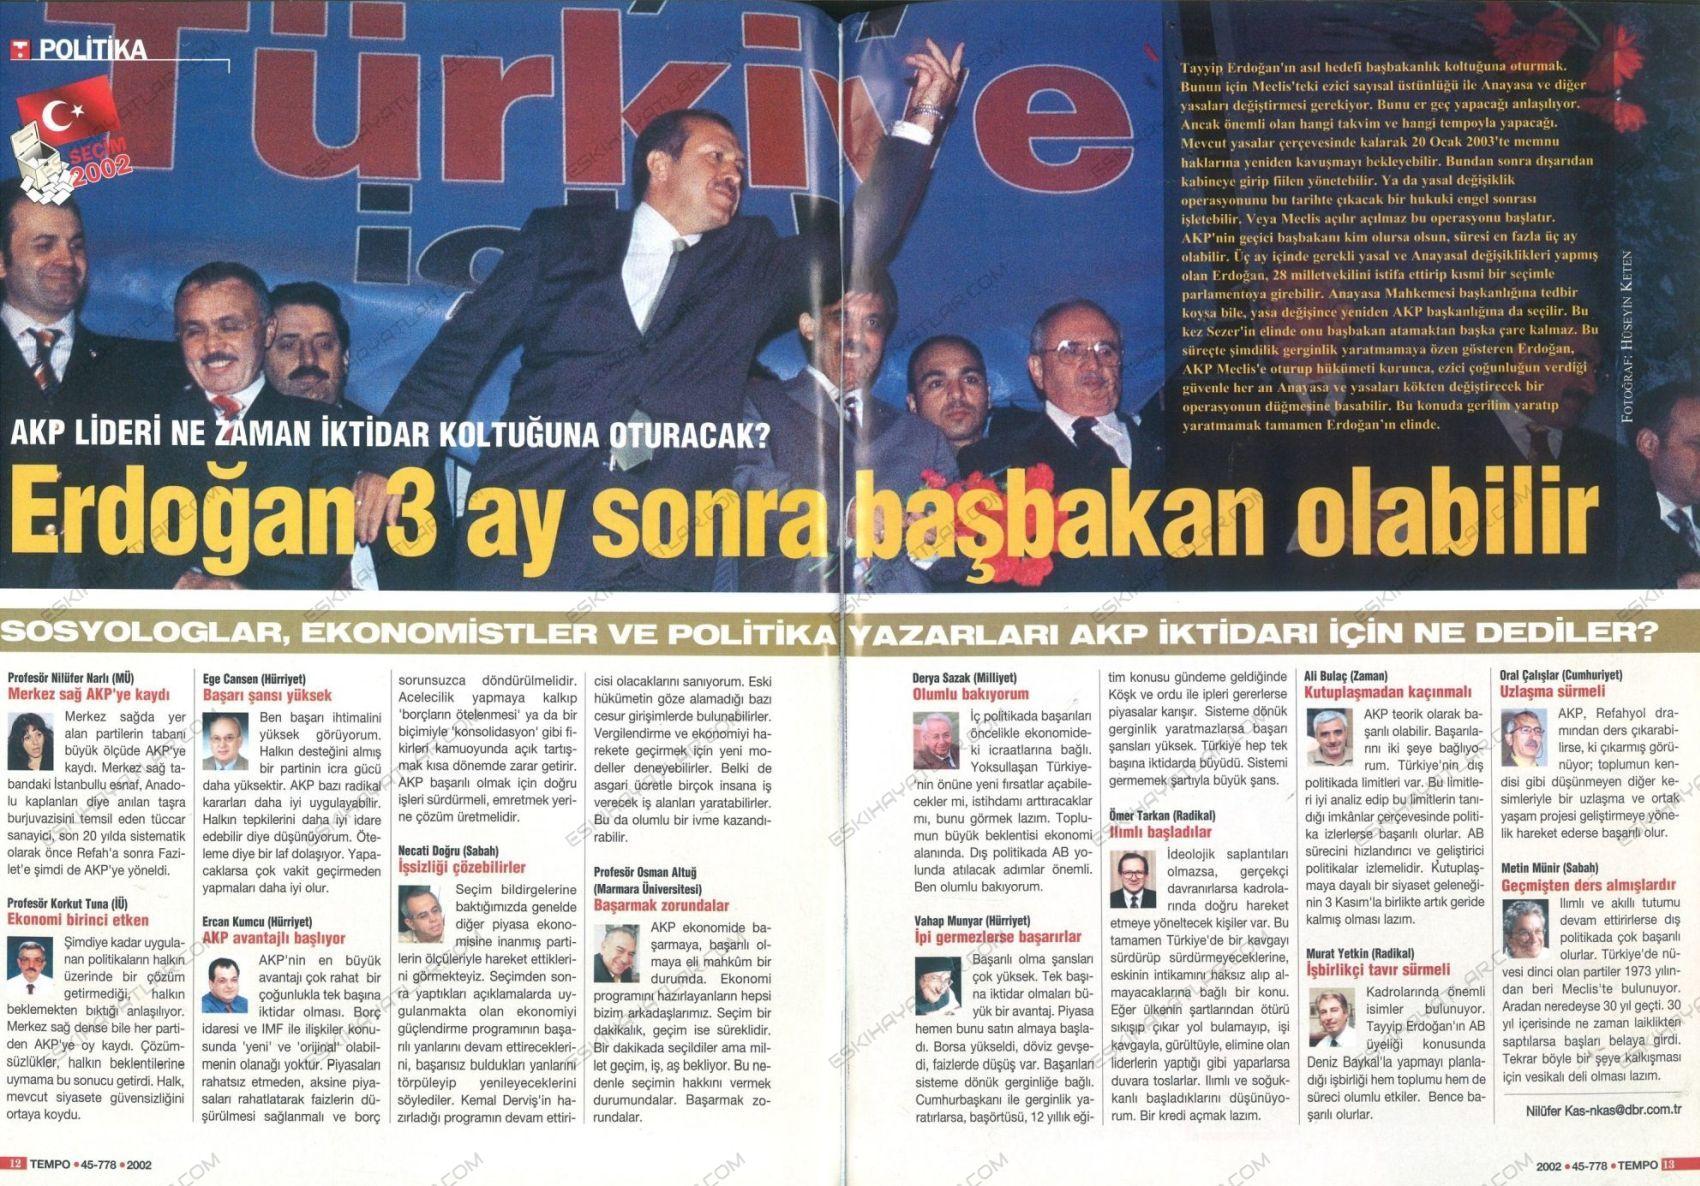 0355-turkiyenin-yeni-umudu-ak-parti-2002-tempo-dergisi-recep-tayyip-erdogan (7)